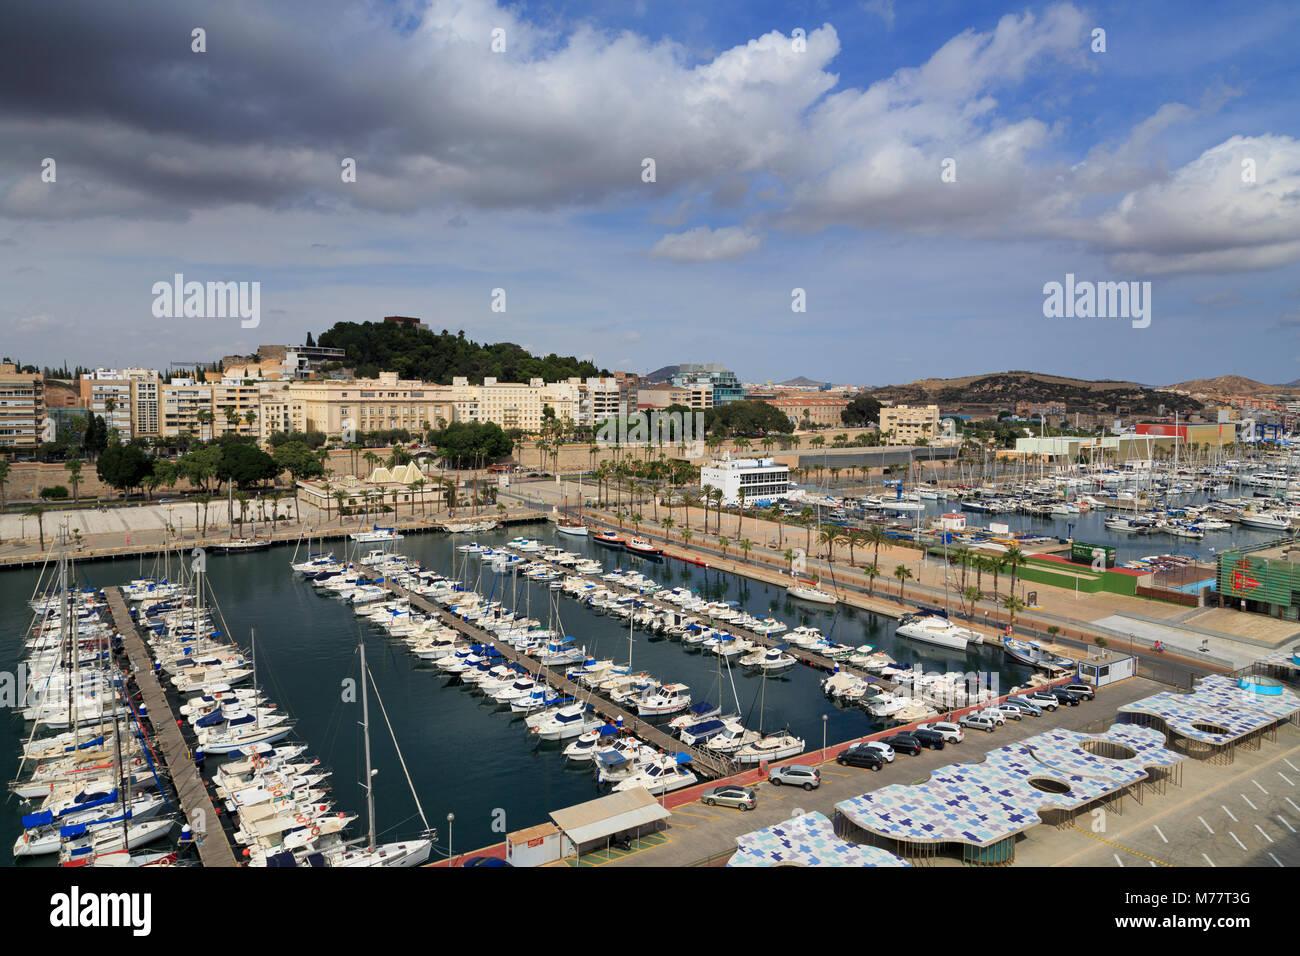 Yacht Marina, Cartagena, Murcia, Spain, Europe - Stock Image